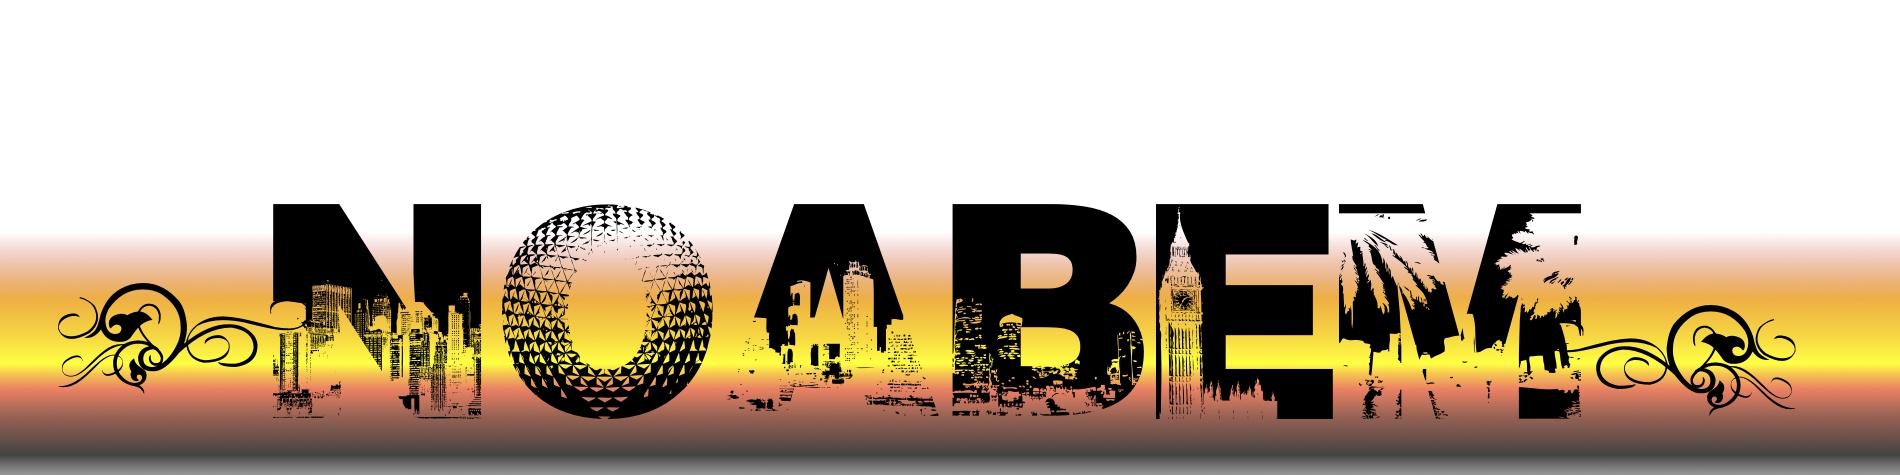 Logo Design by dallywopper - Entry No. 28 in the Logo Design Contest Artistic Logo Design for подъем.